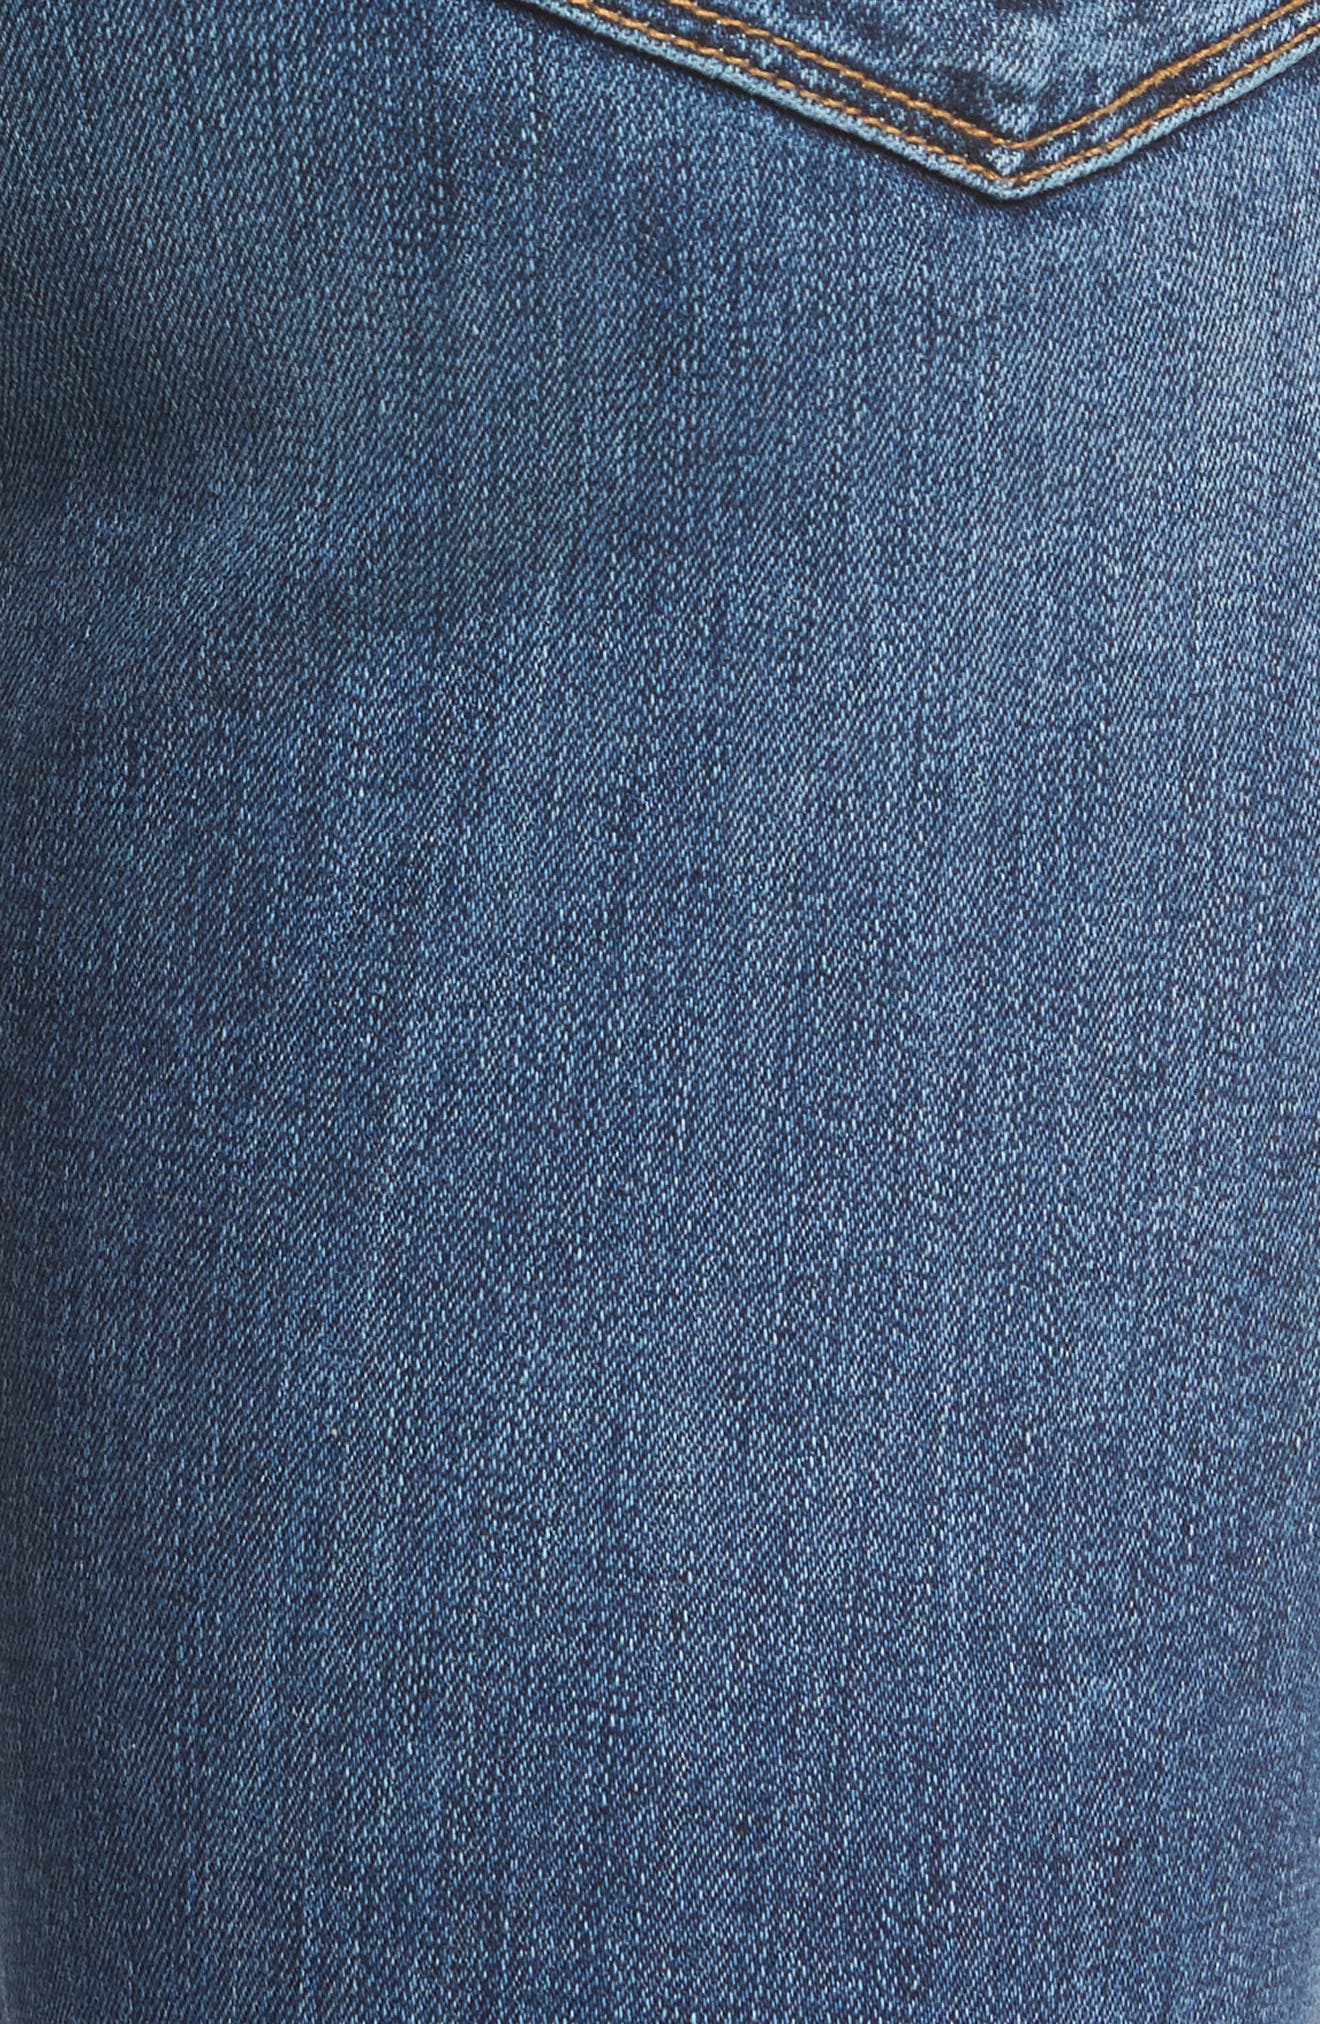 Tally Unfamed Hem Skinny Jeans,                             Alternate thumbnail 5, color,                             Split Second